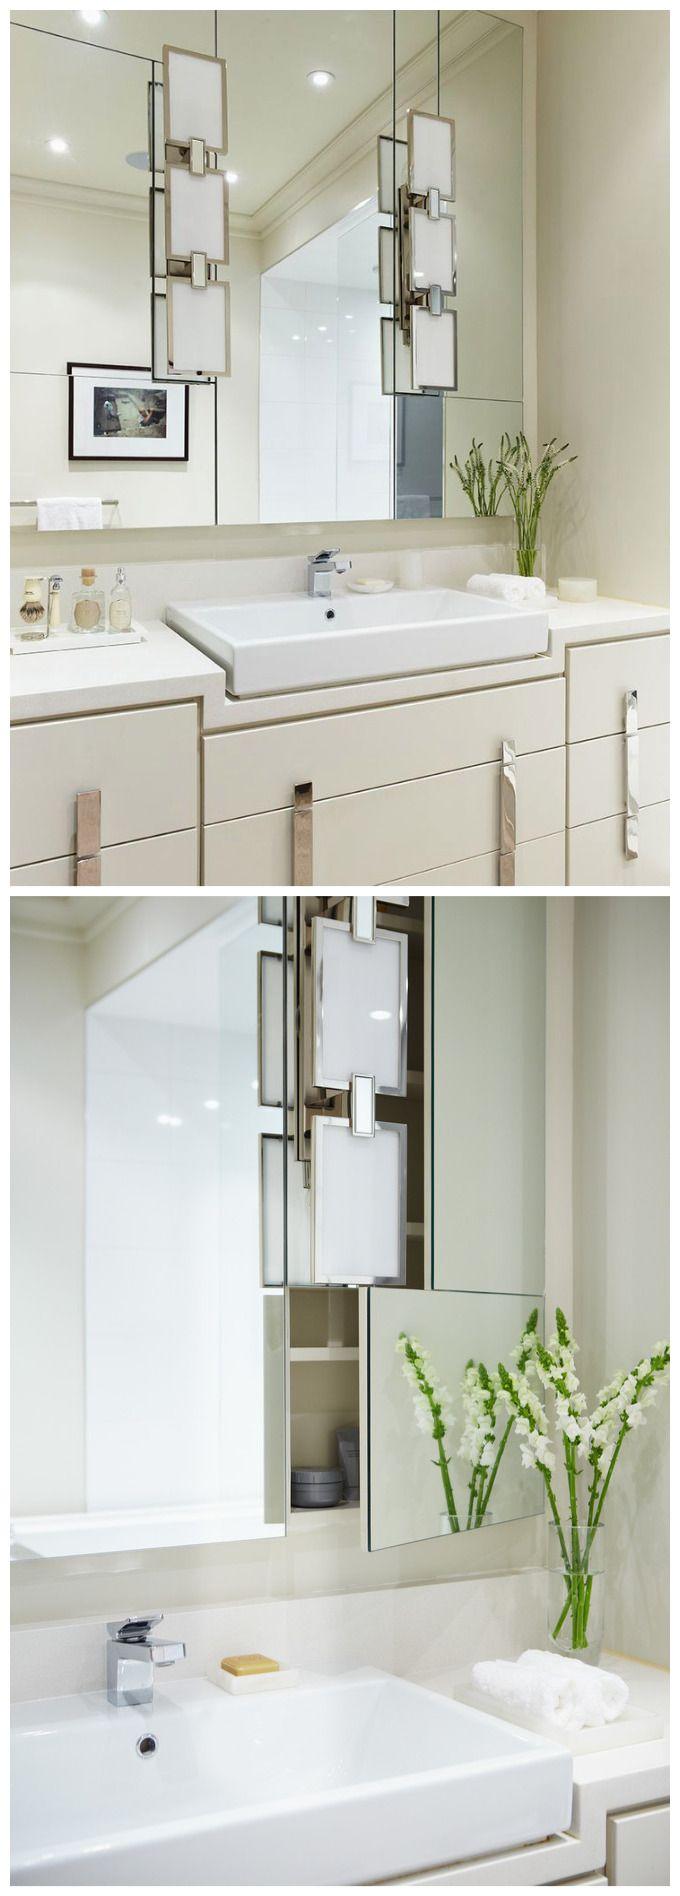 Kent Medicine Cabinet 25 Best Ideas About Contemporary Medicine Cabinets On Pinterest